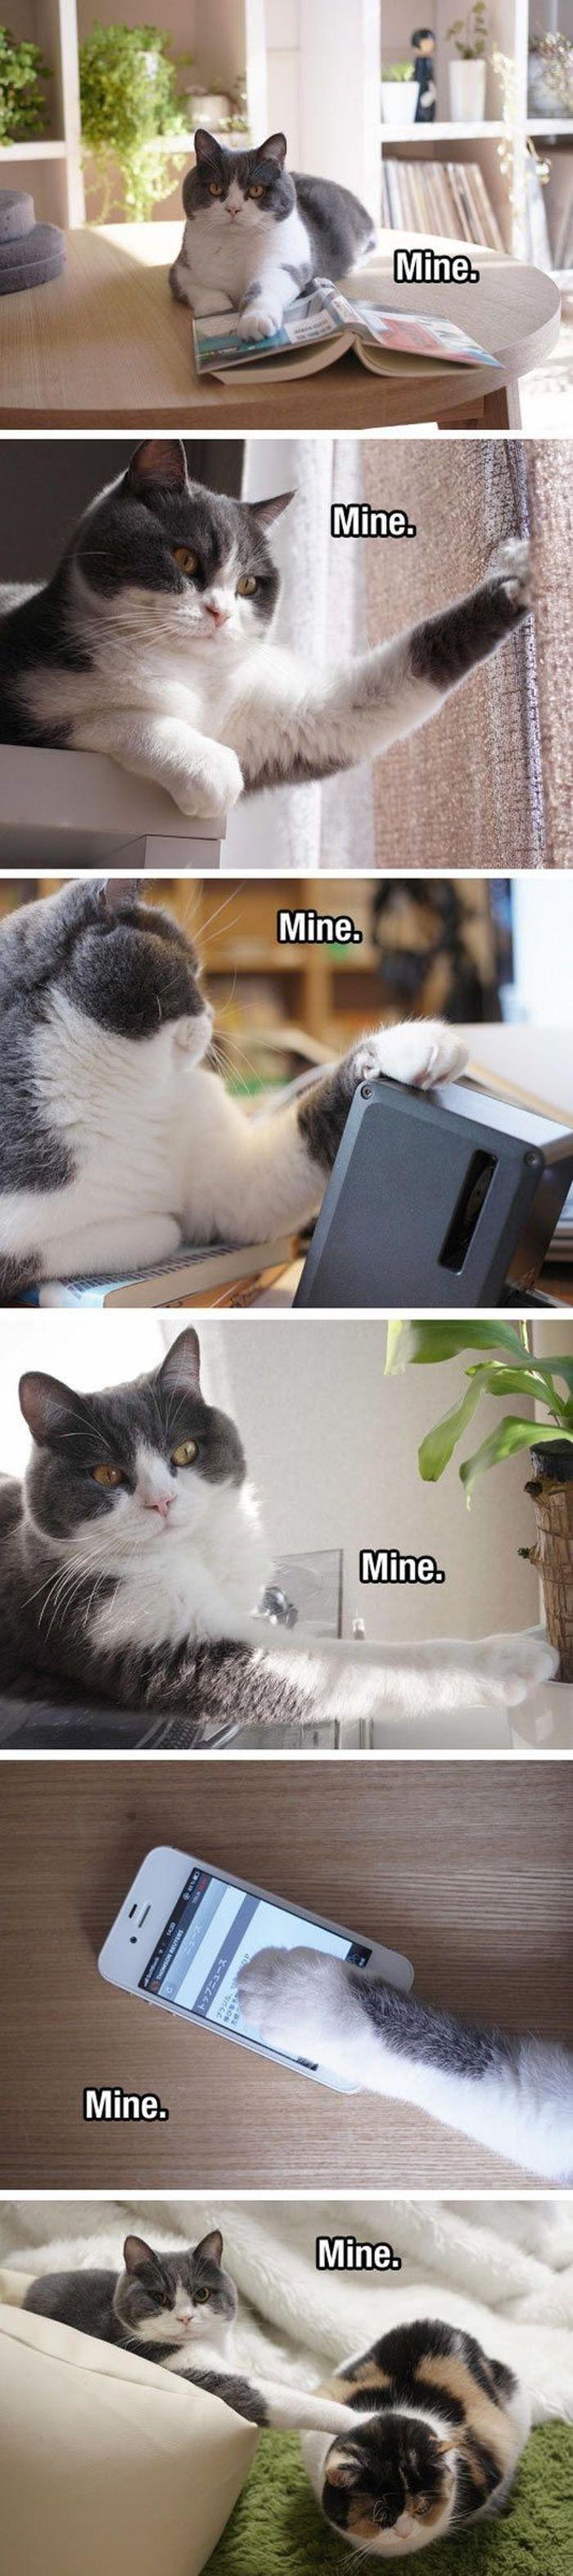 Memes de animales del día 30 fotos – Ep26 #memes #animalmemes #lovelyanimalsworld